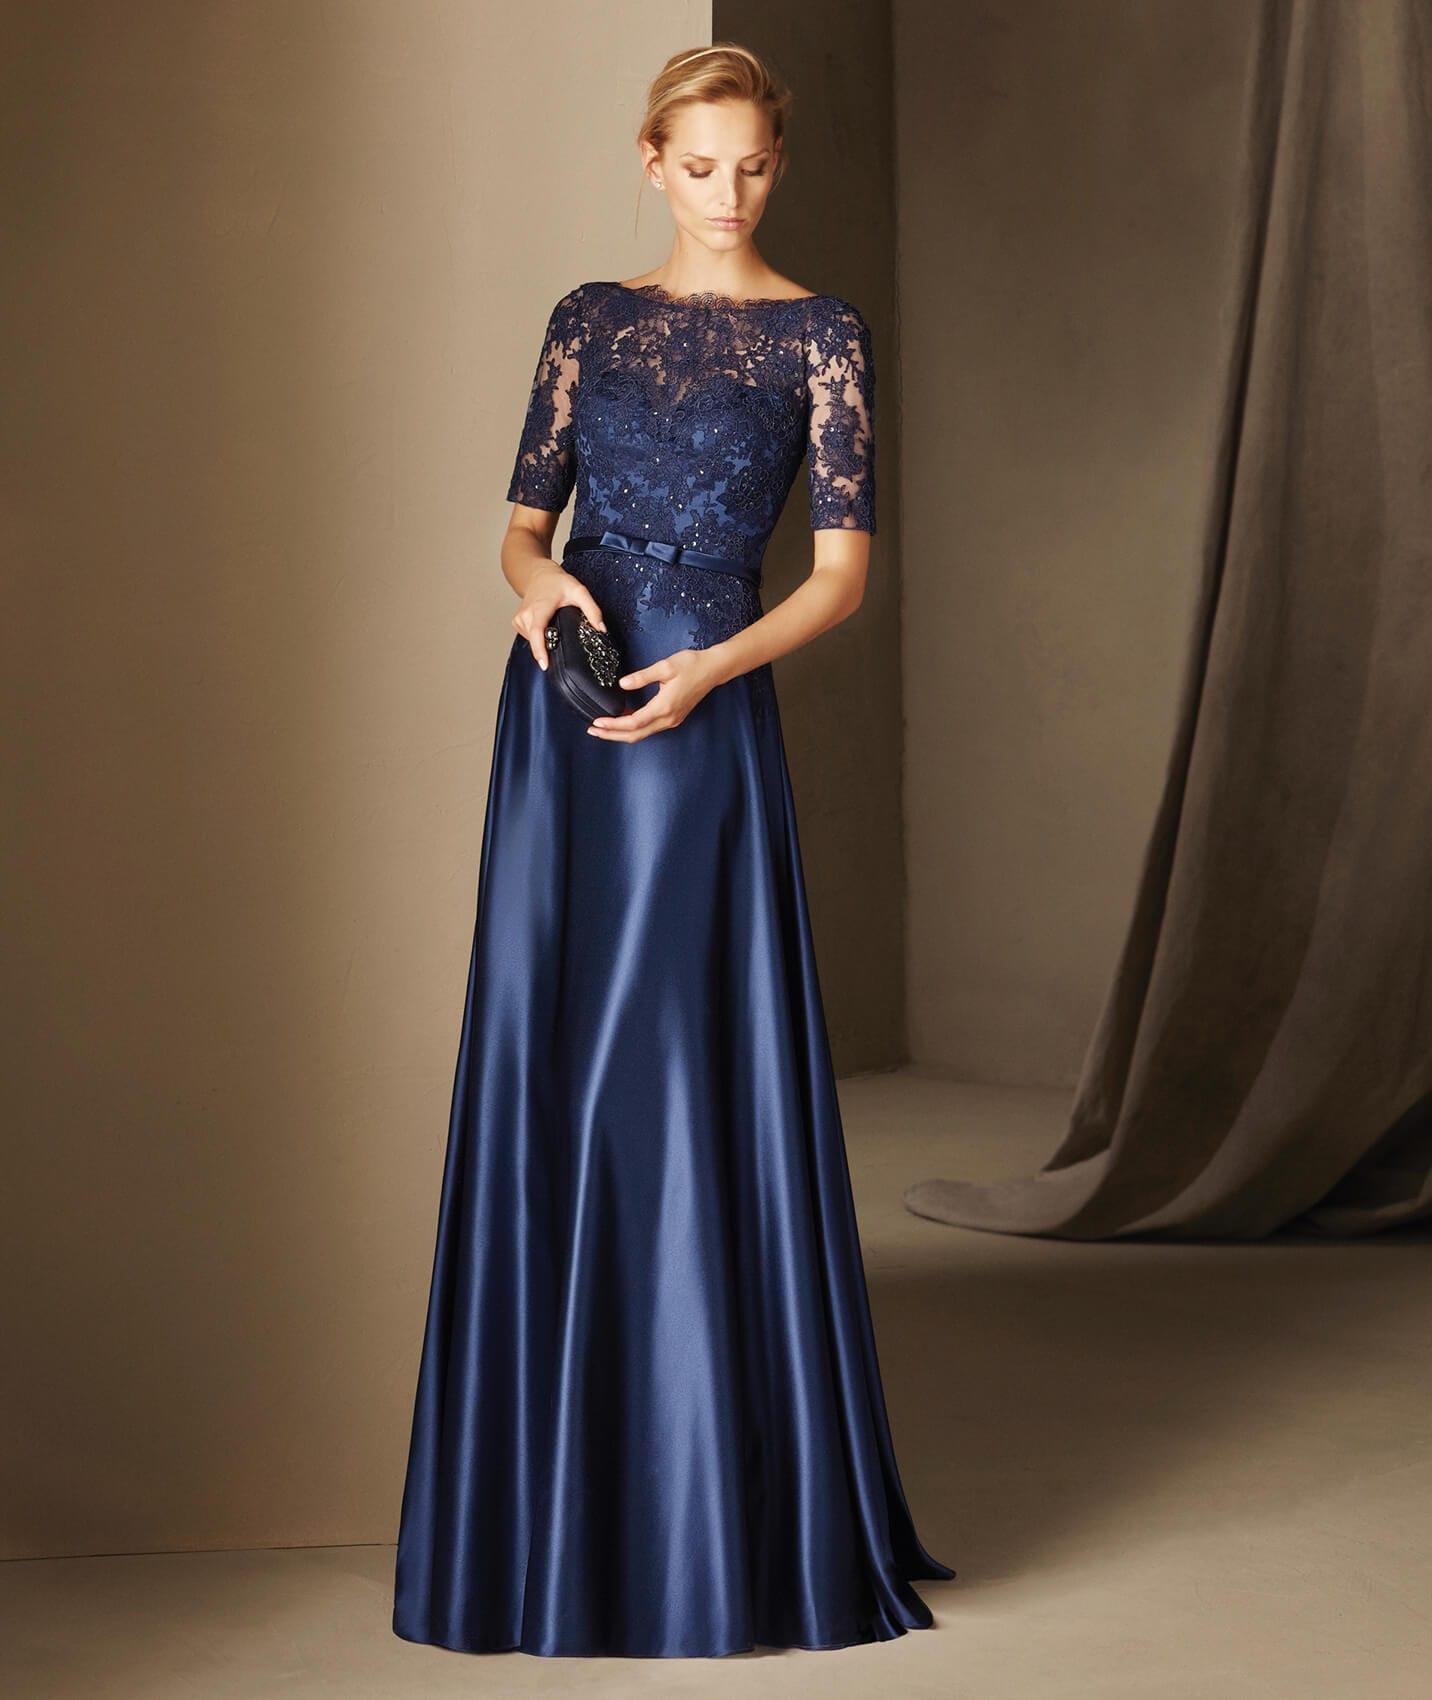 Boada dress